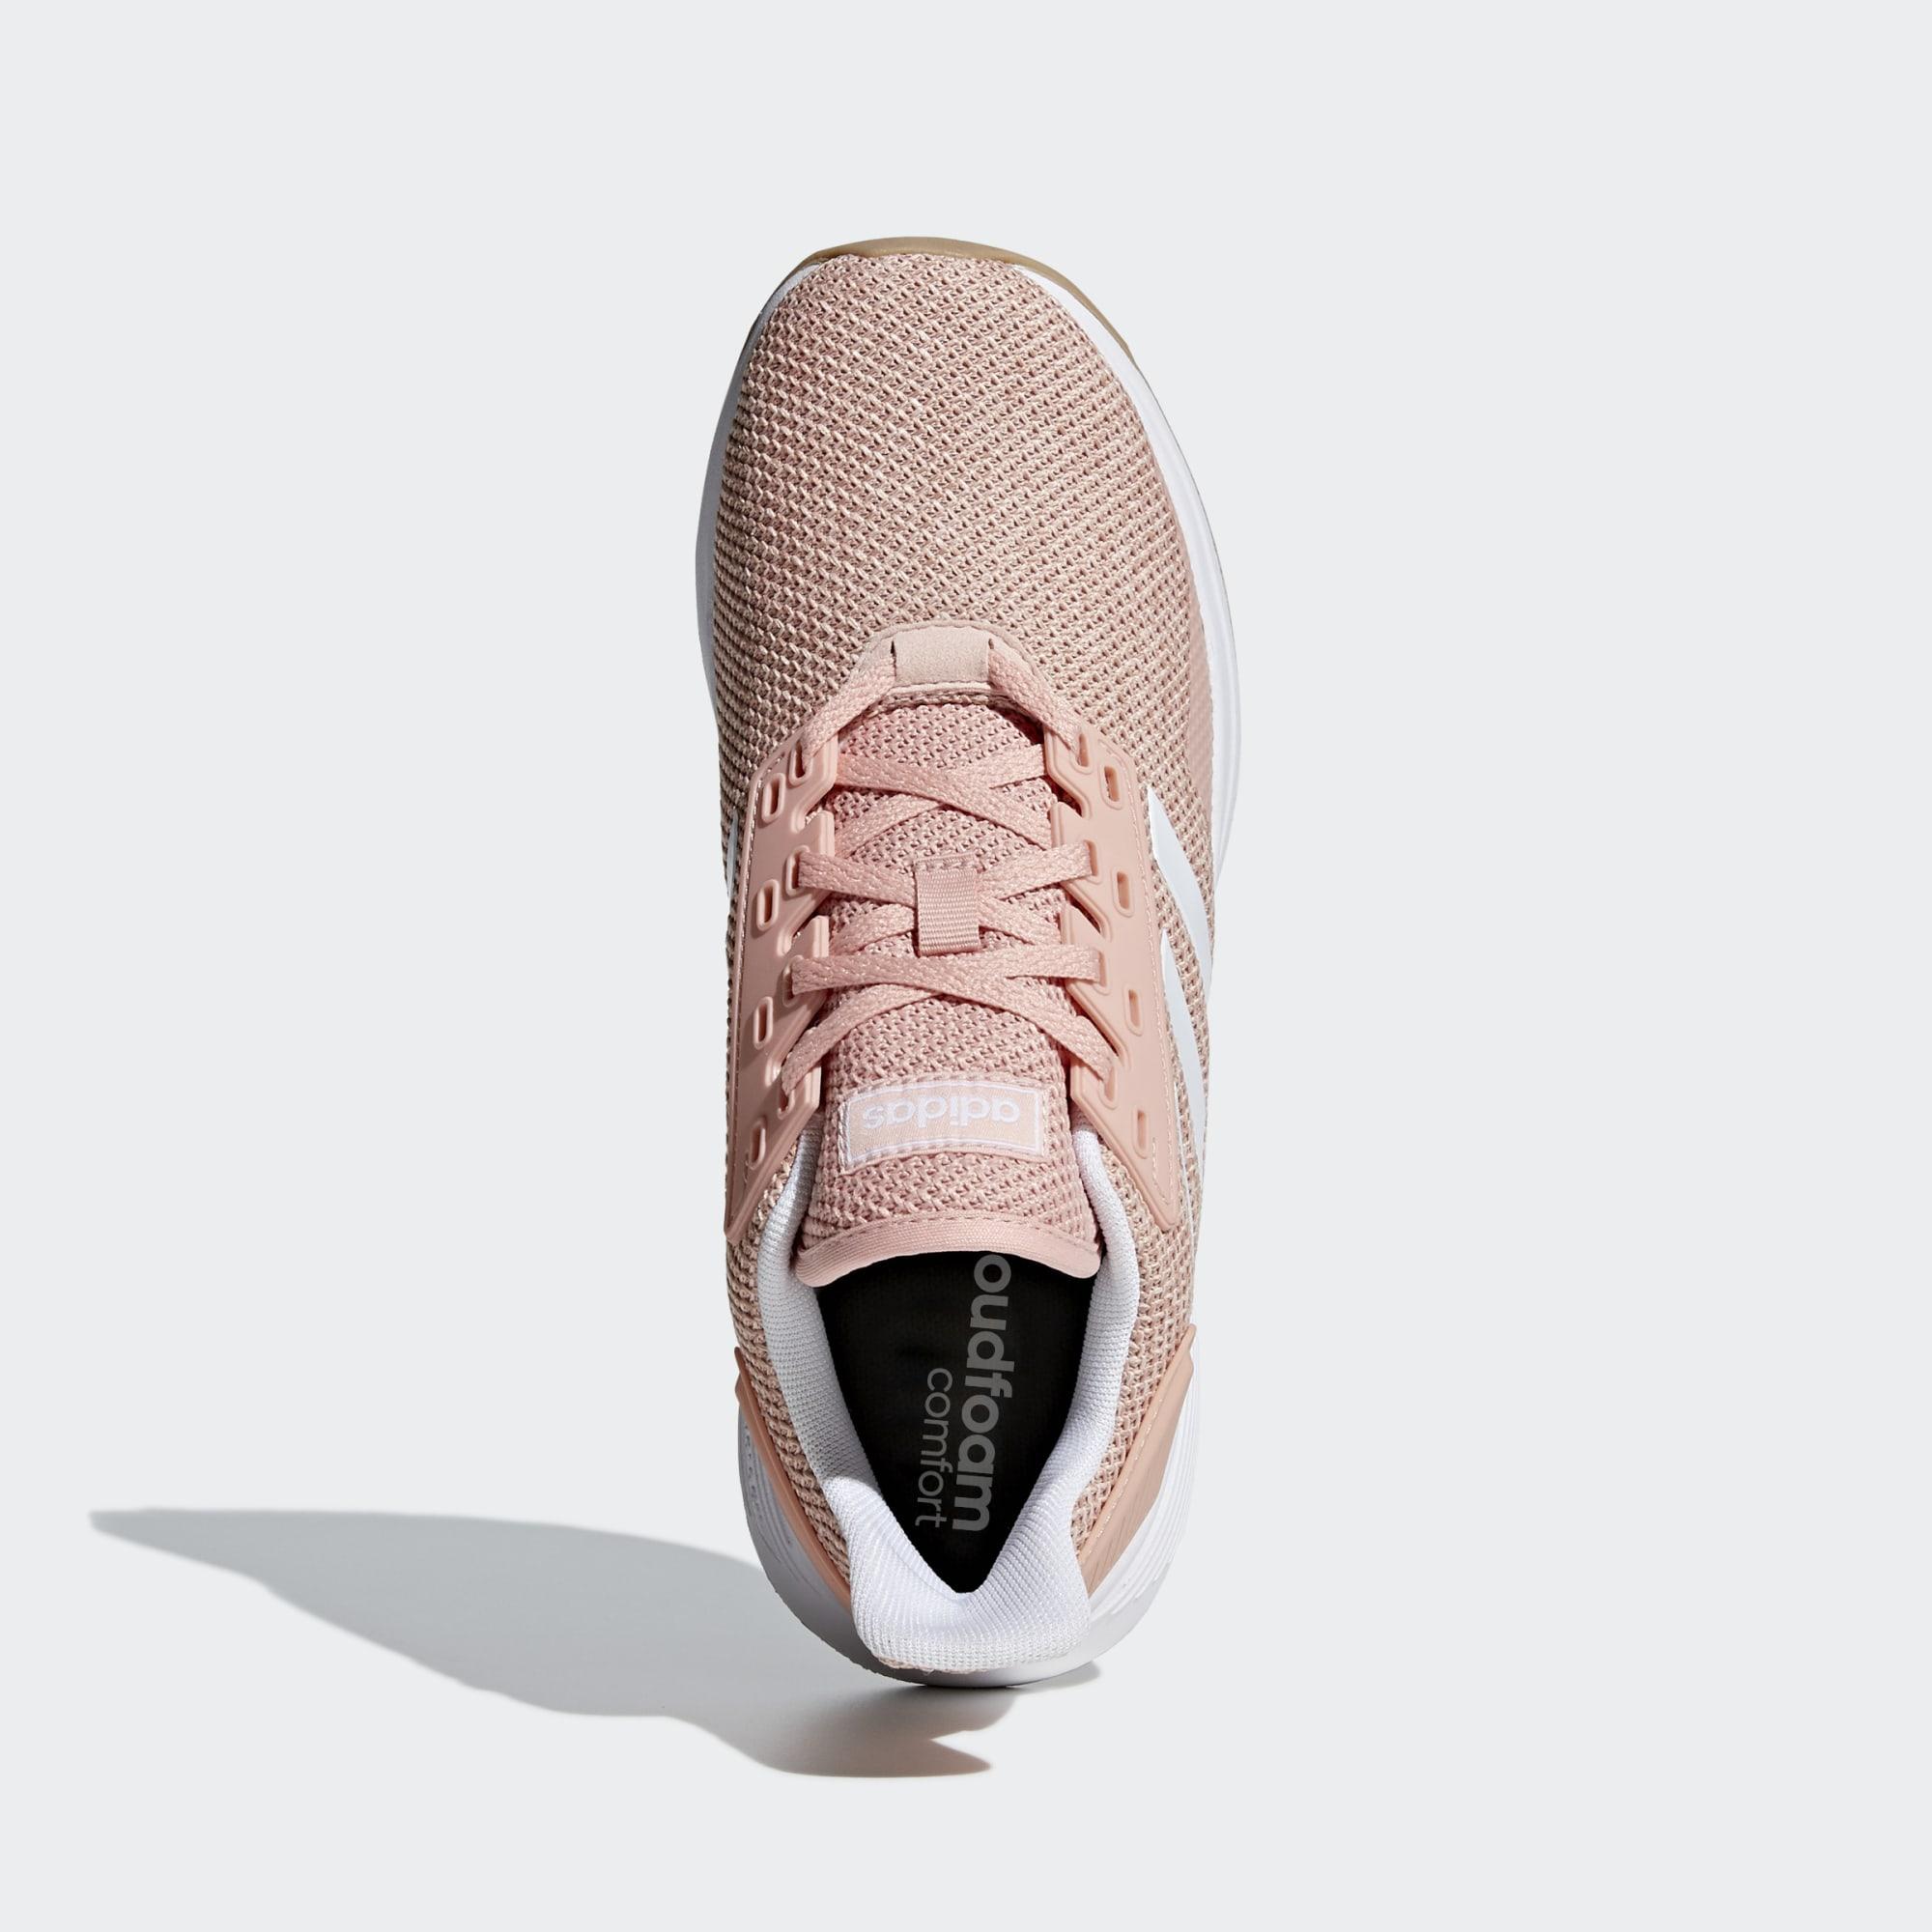 Tenis Adidas Rose Feminino Duramo 9